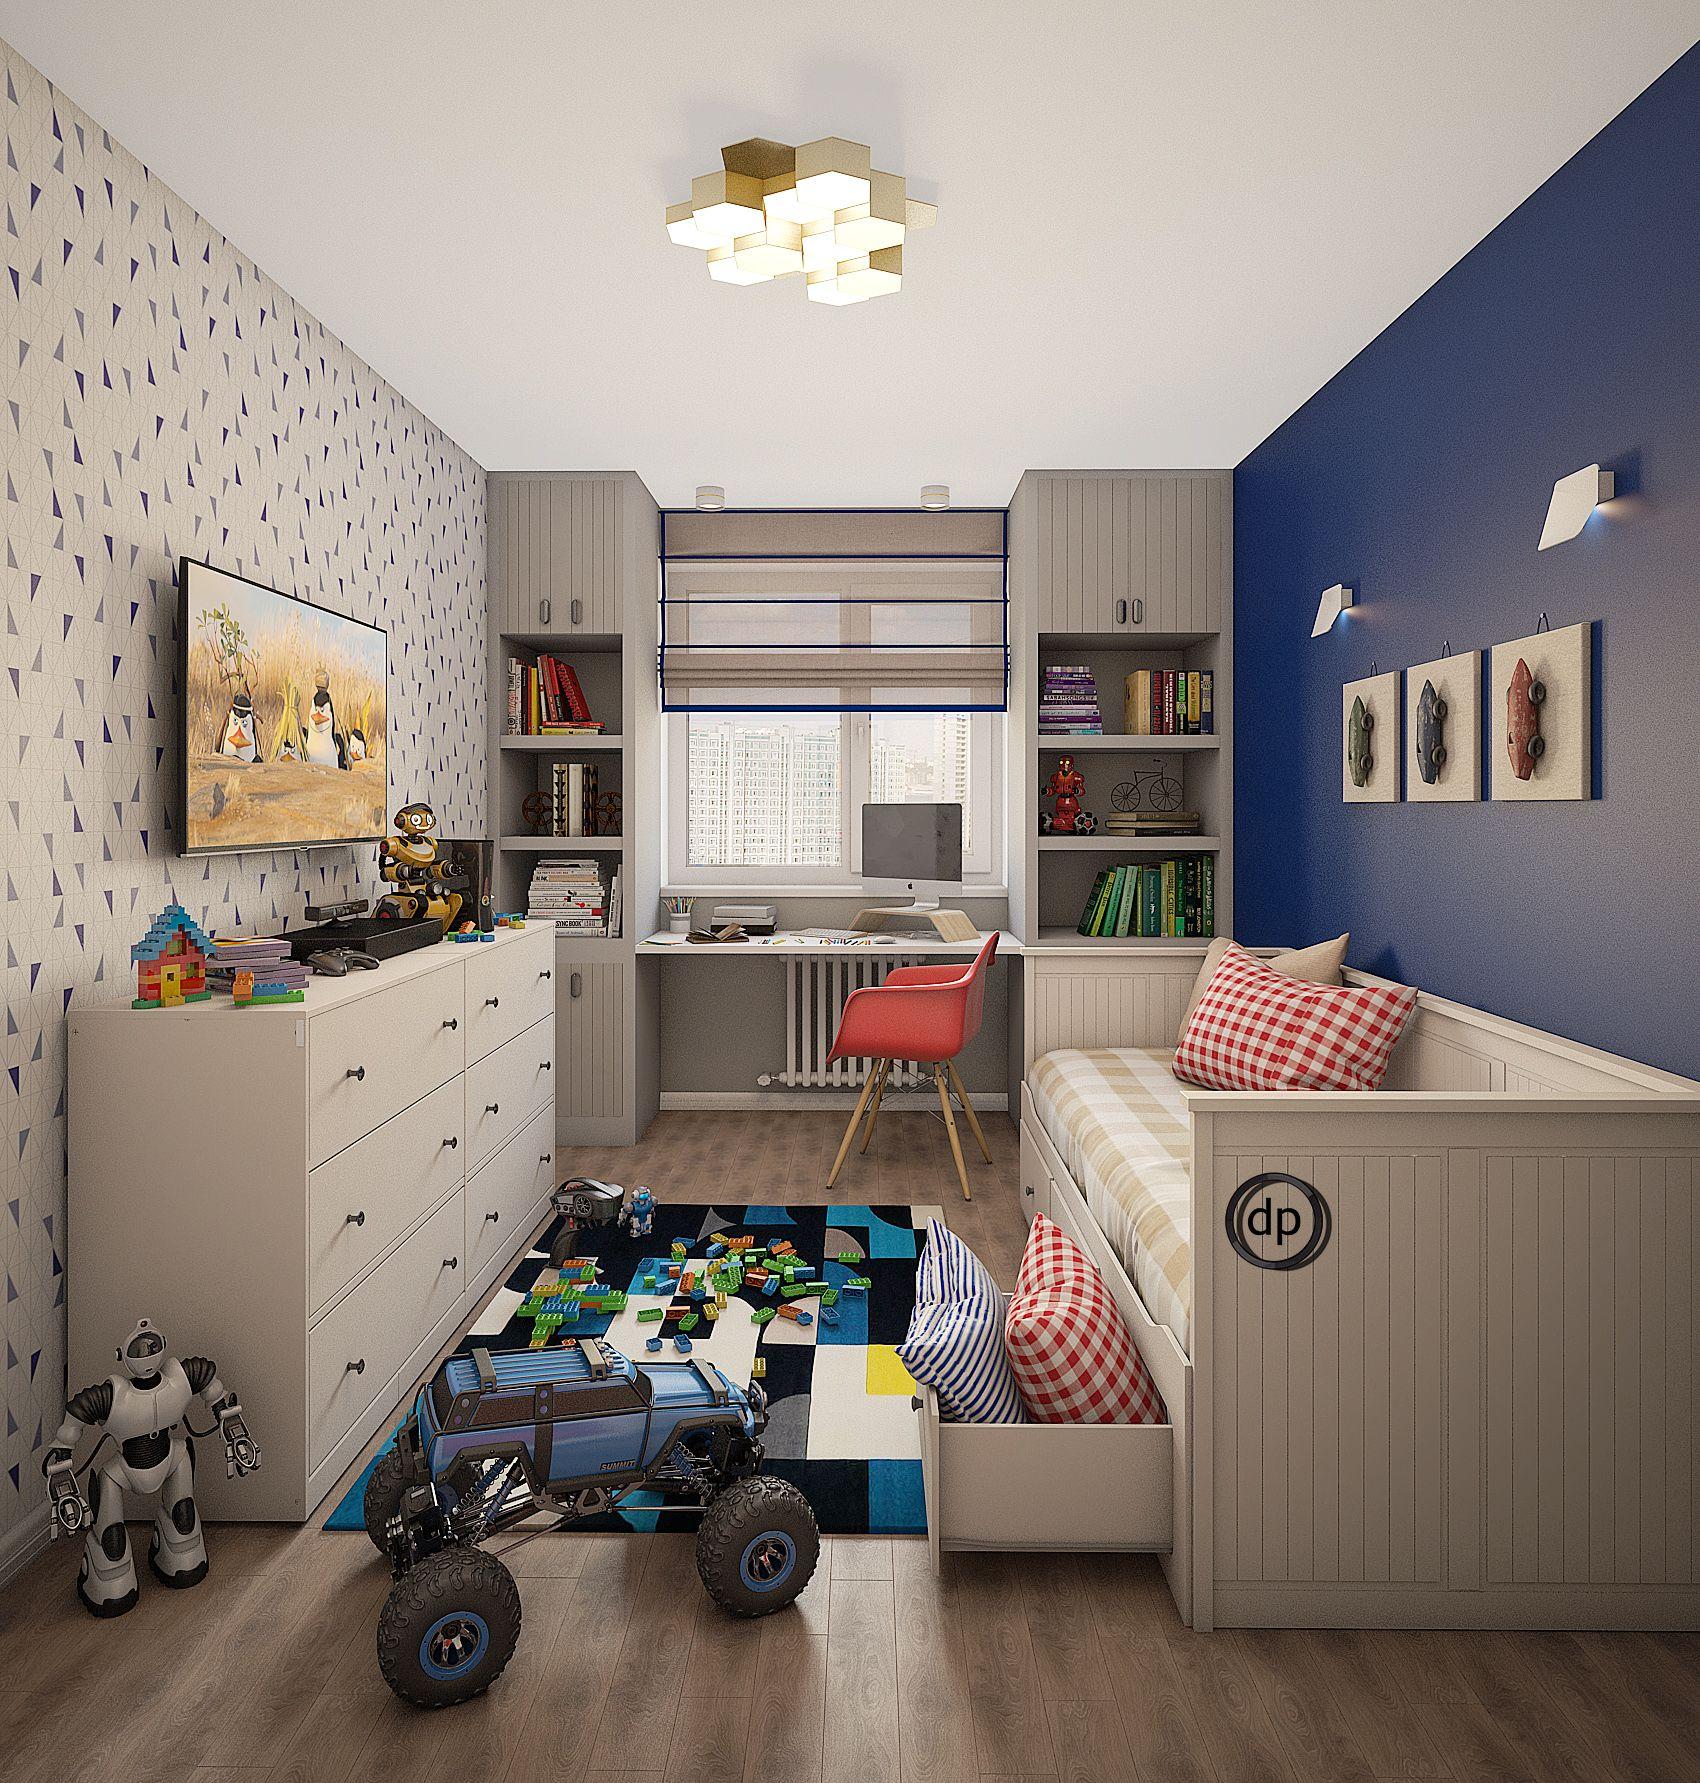 Playroom | kids room ideas | Pinterest | Kinderzimmer, Jugendzimmer ...